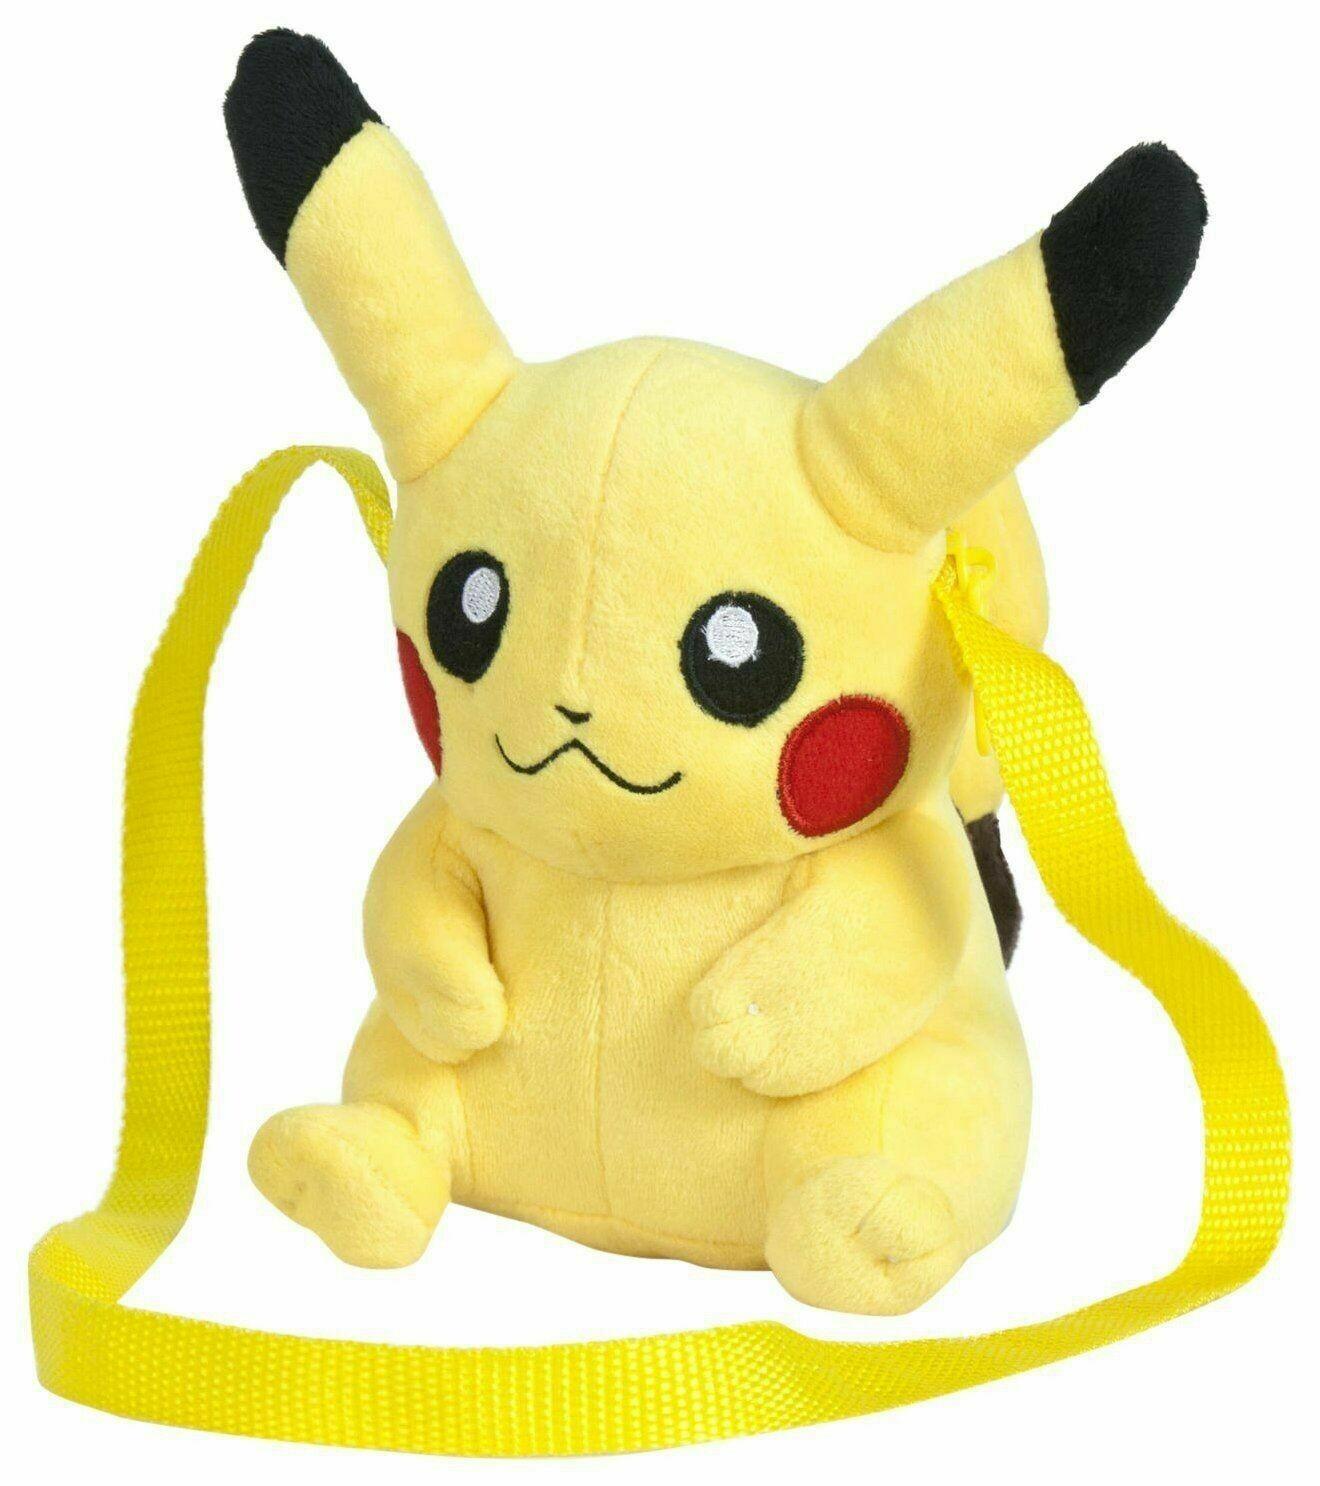 Pokemon 'Pikachu' 10 Inch School Cross Body Bag